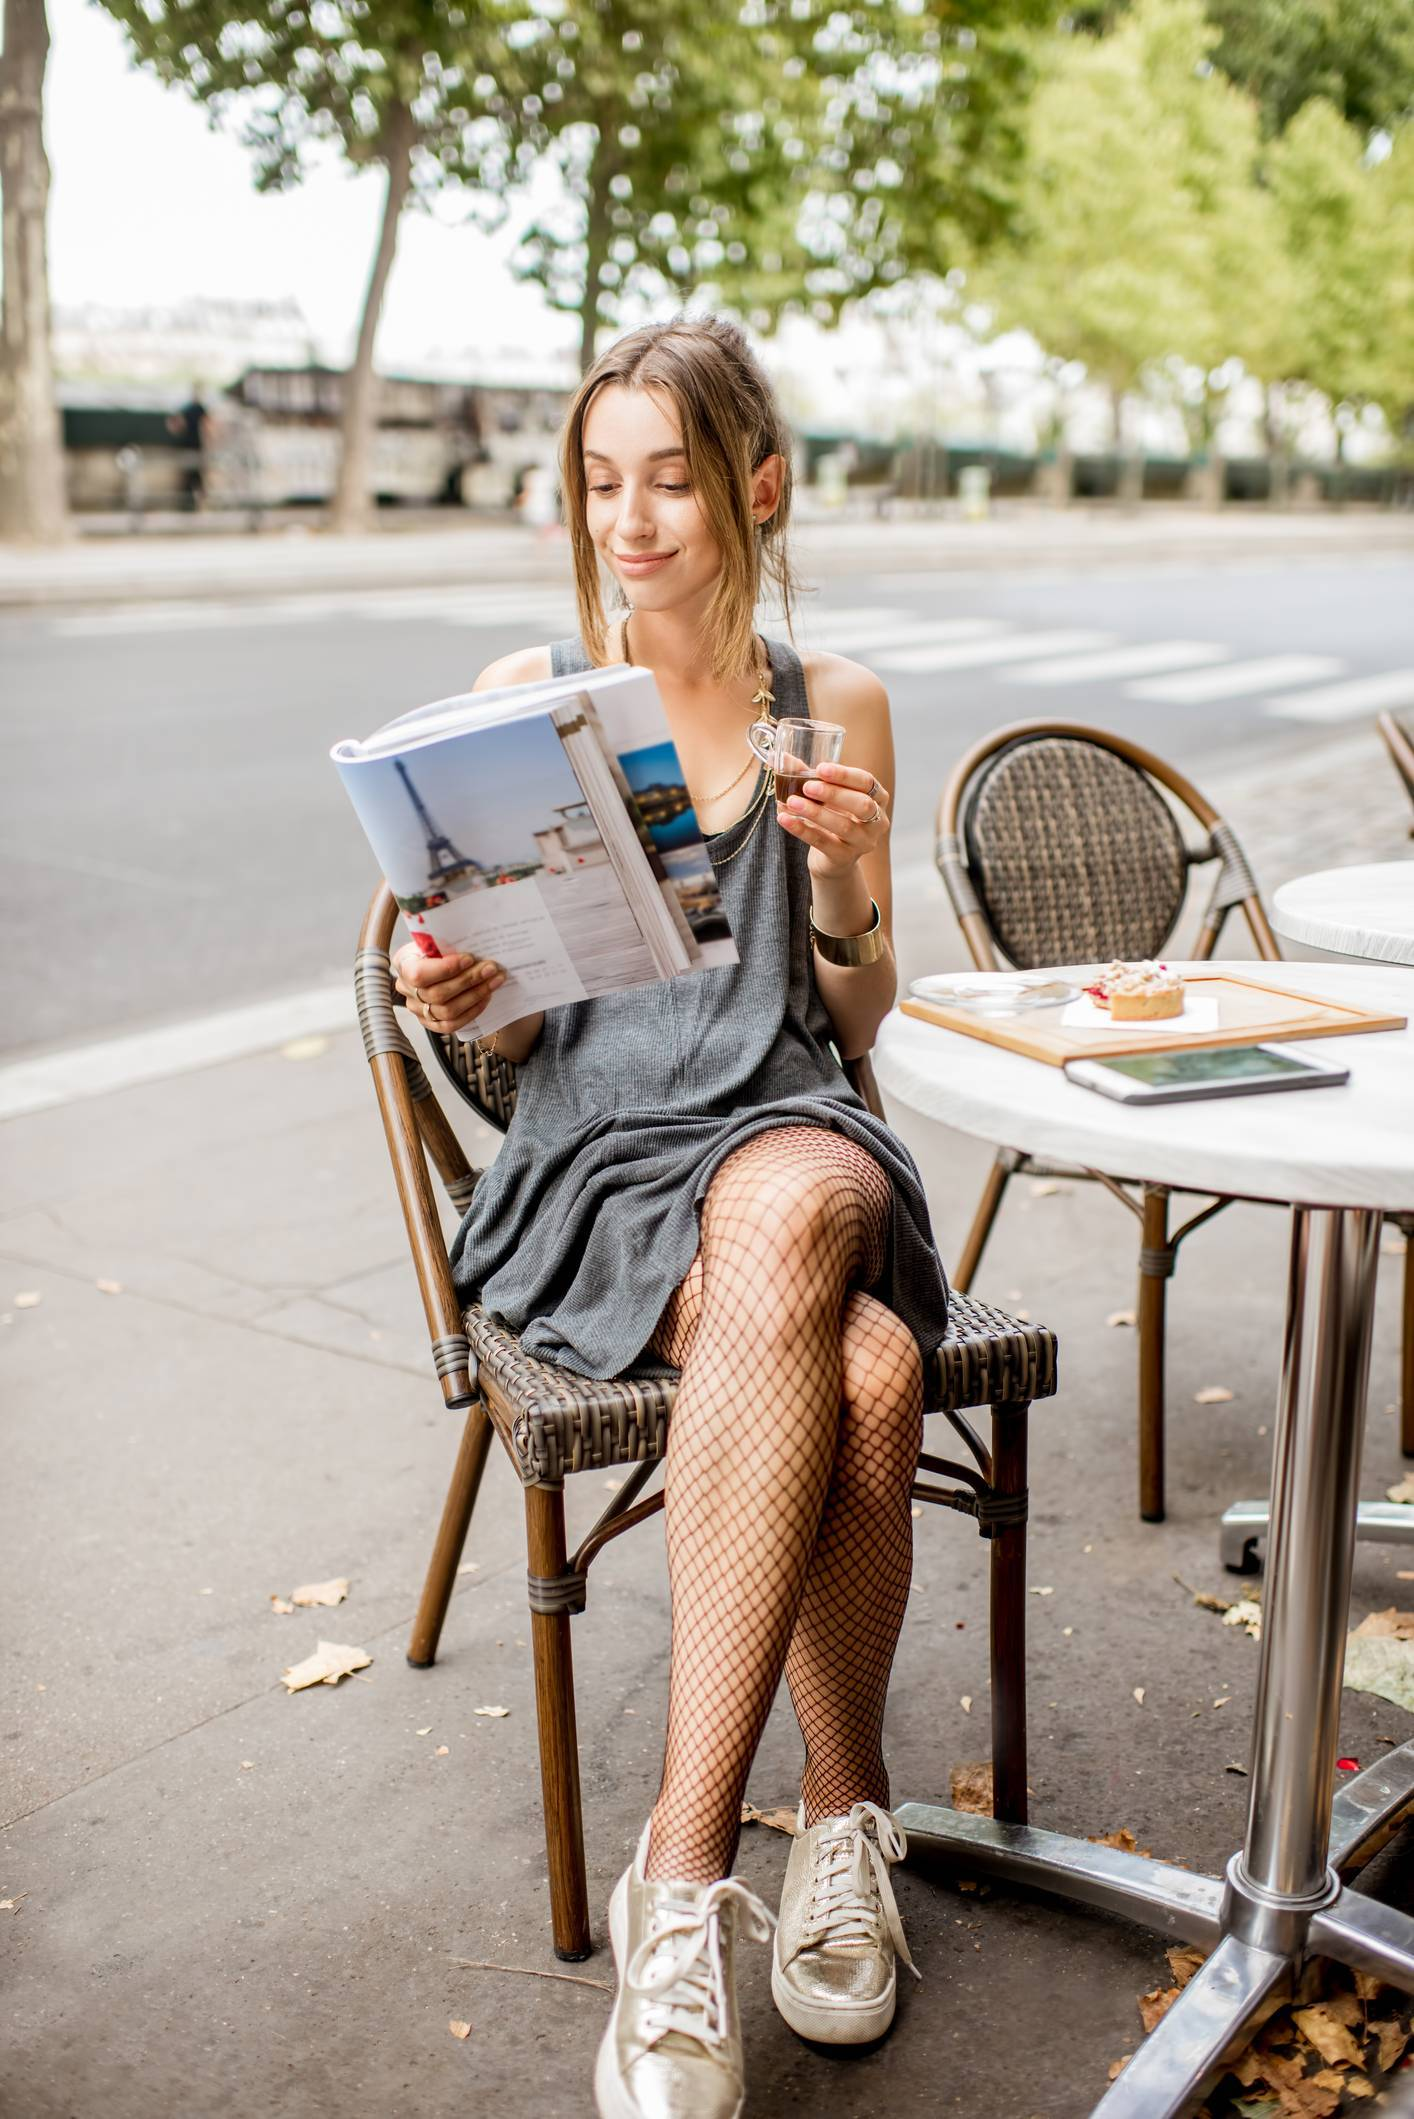 picture magazine feminin - Comment choisir son magazine féminin?